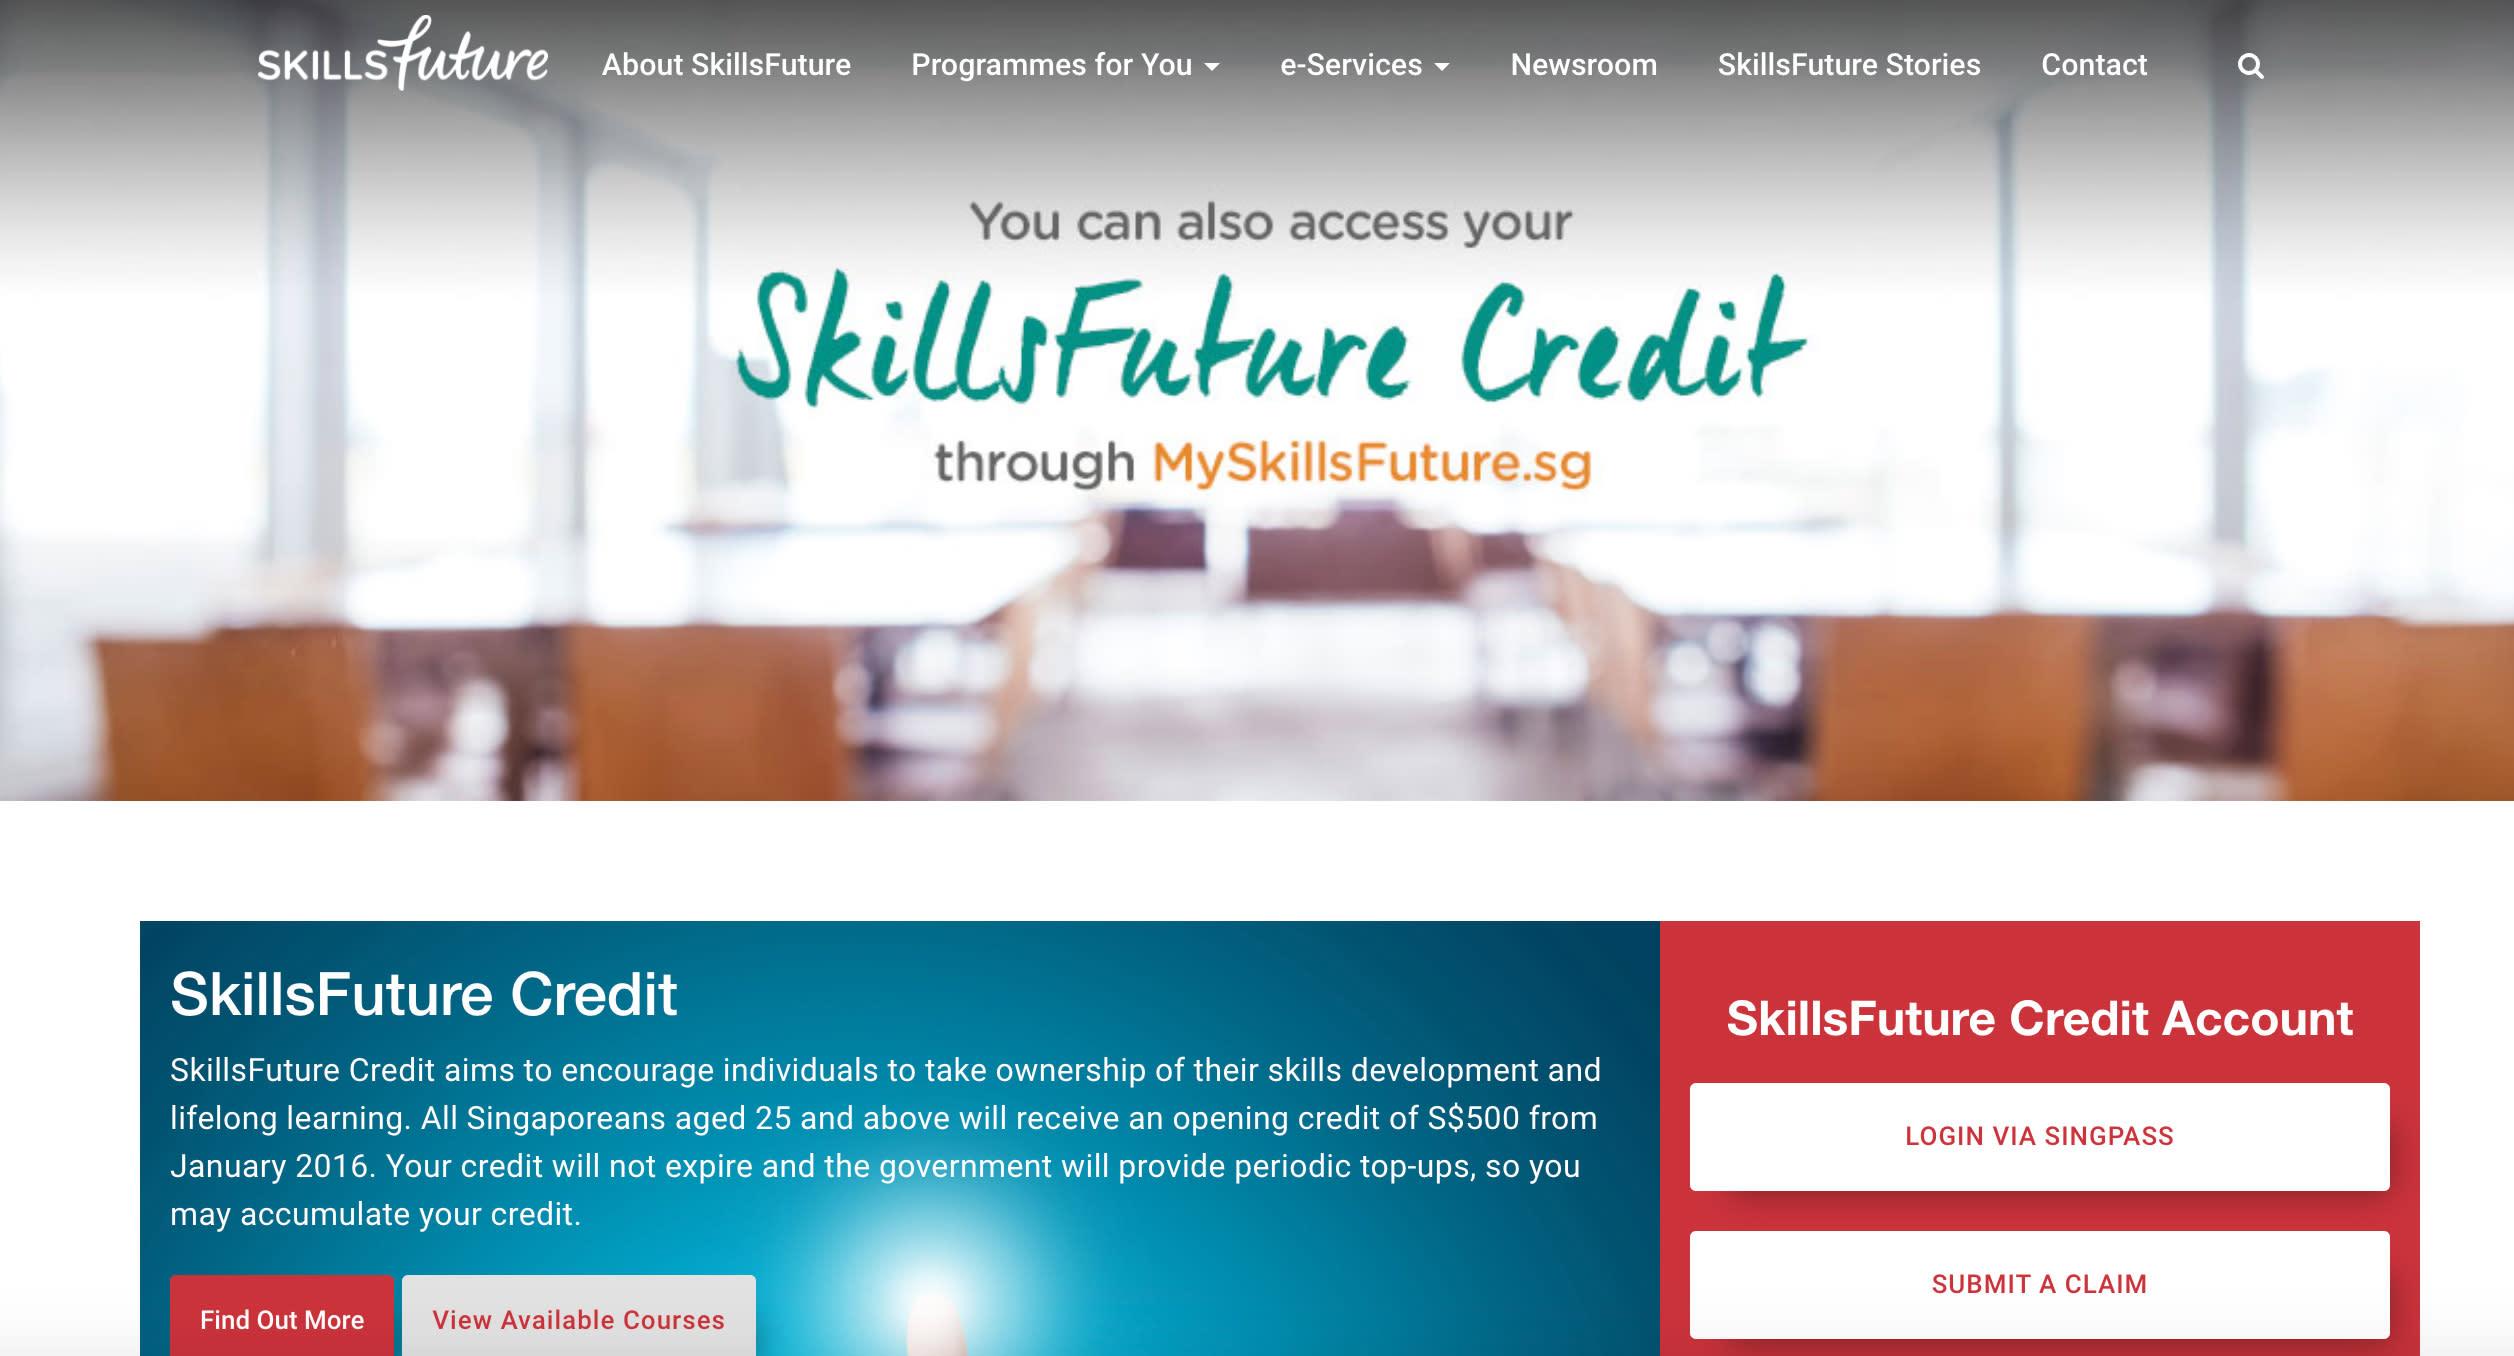 Budget 2020: SkillsFuture expansion to aid Singaporeans' development